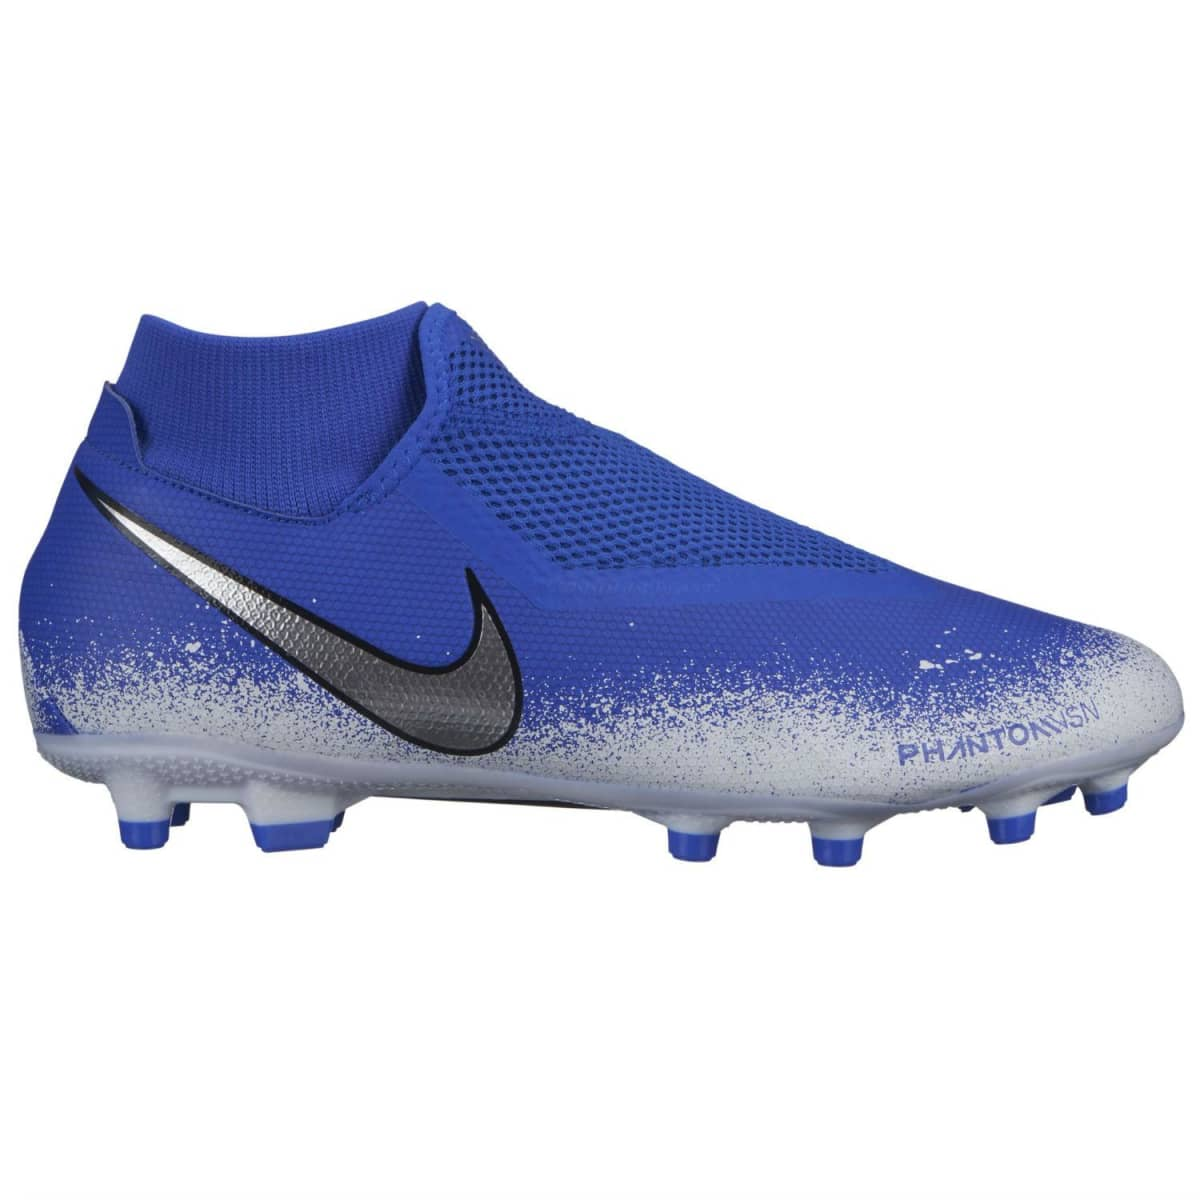 67ee929a6d3 Product Image. Nike Phantom VSN Academy DF ...